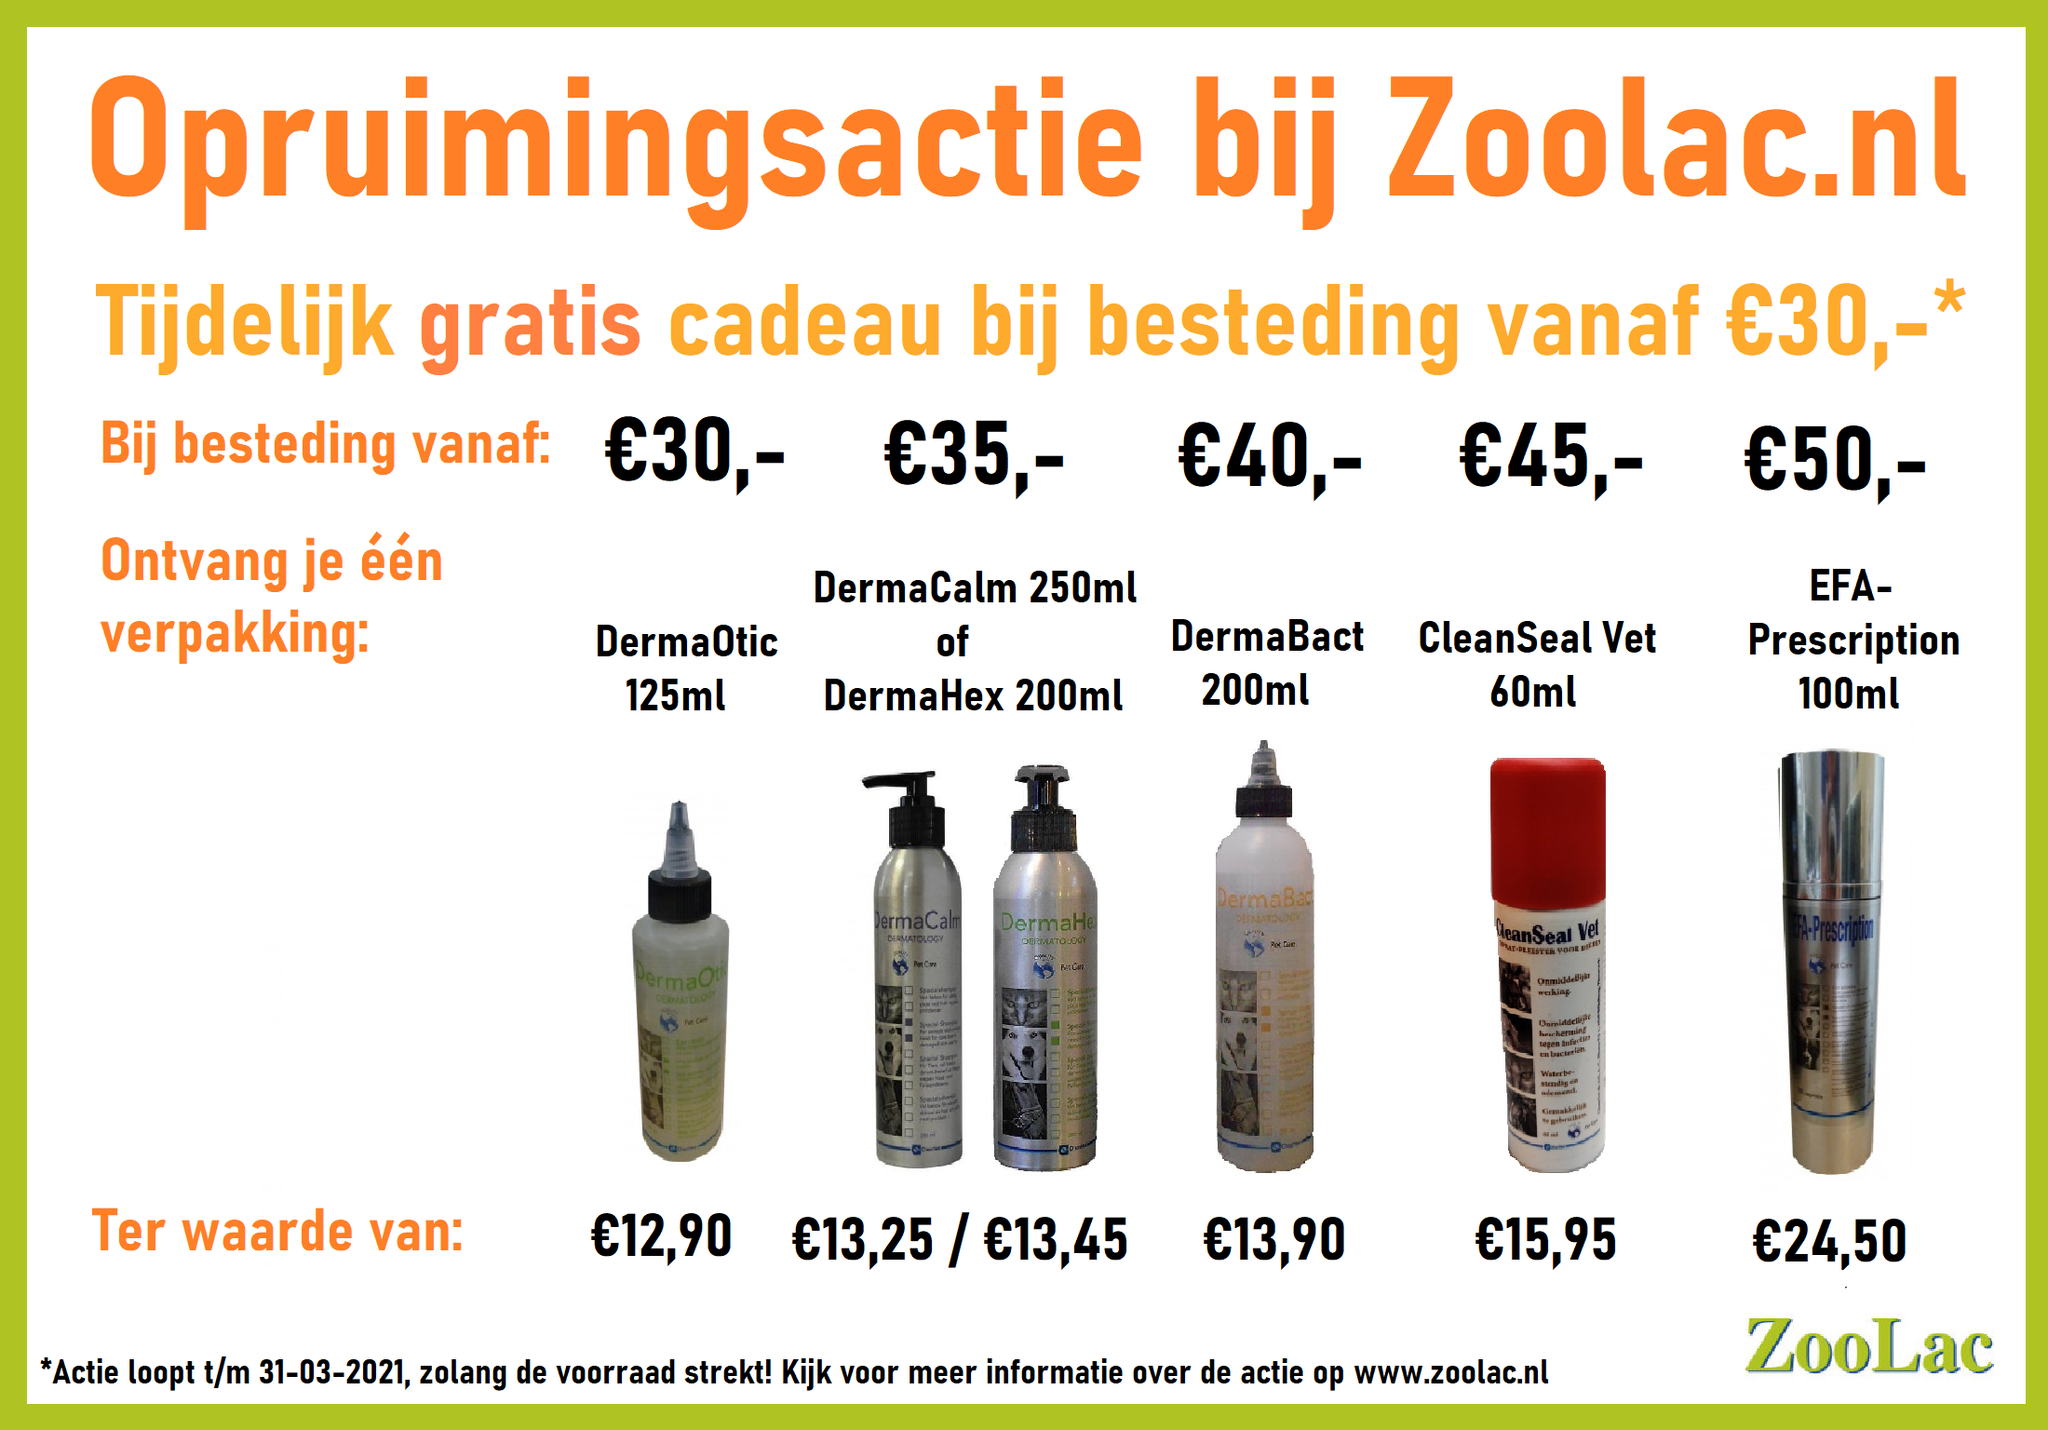 Opruimingsactie gratis cadeau op zoolac.nl